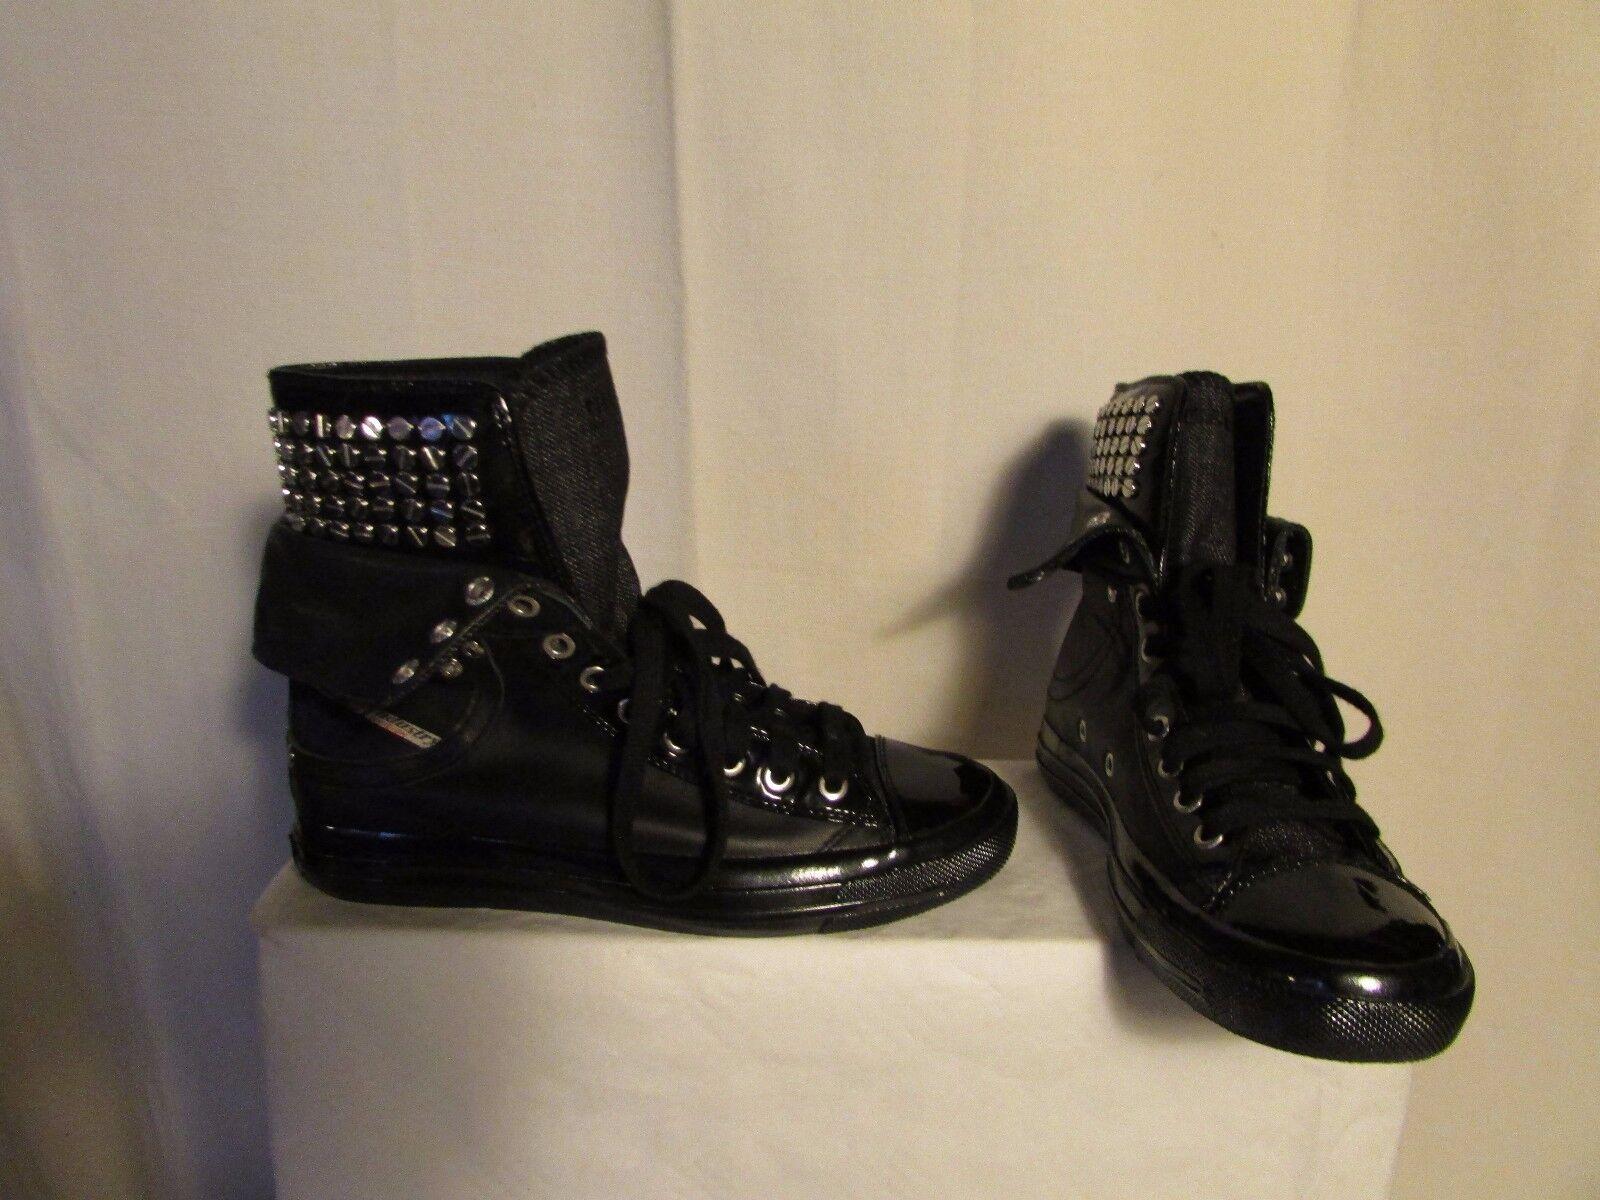 baskets DIESEL cuir noir et métal 36,5